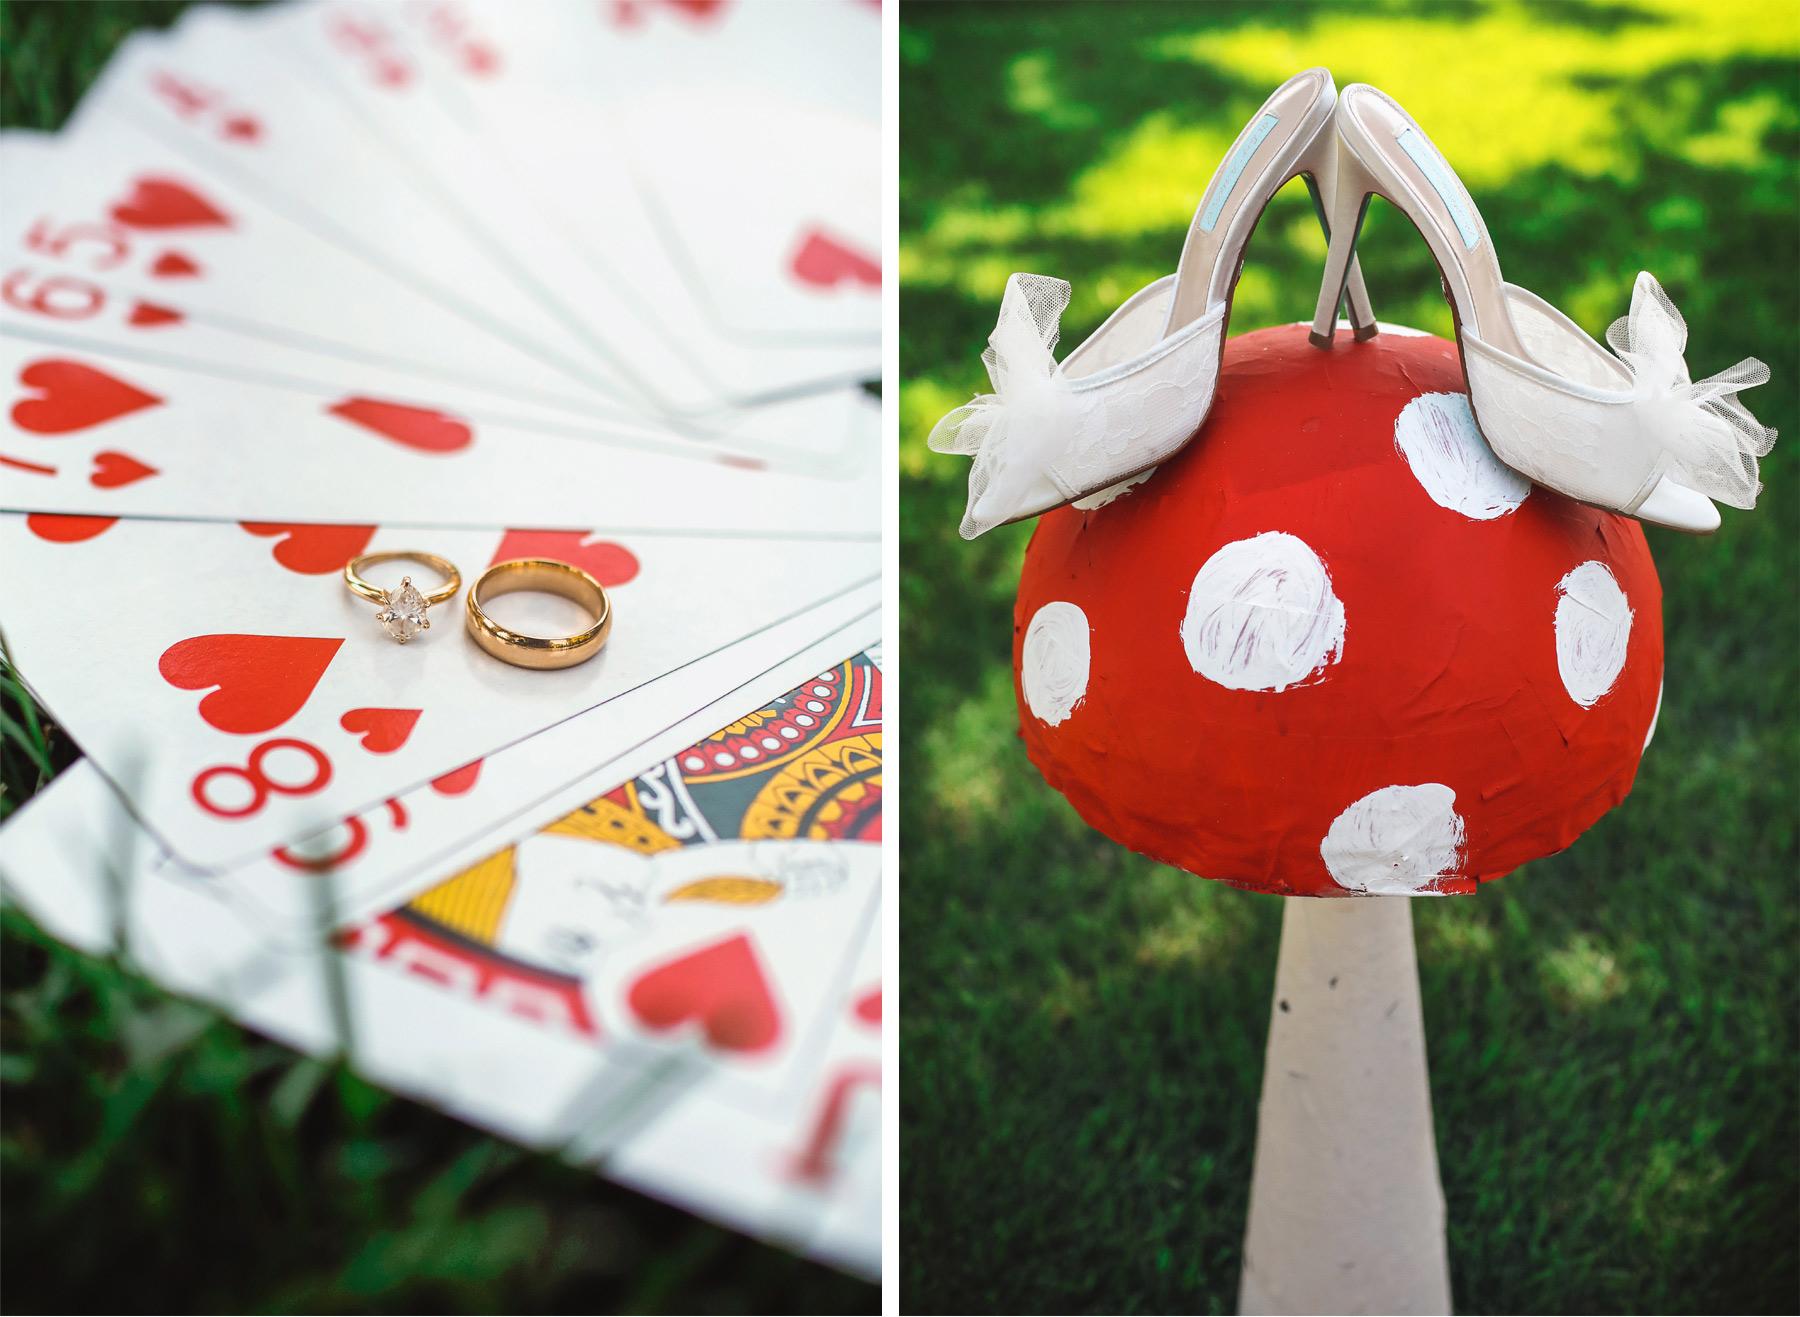 01-Vick-Photography-Wedding-Ottertail-Minnesota-Alice-in-Wonderland-Theme-Mushroom-Toadstool-Playing-Cards-Rings-Tess-and-Greg.jpg